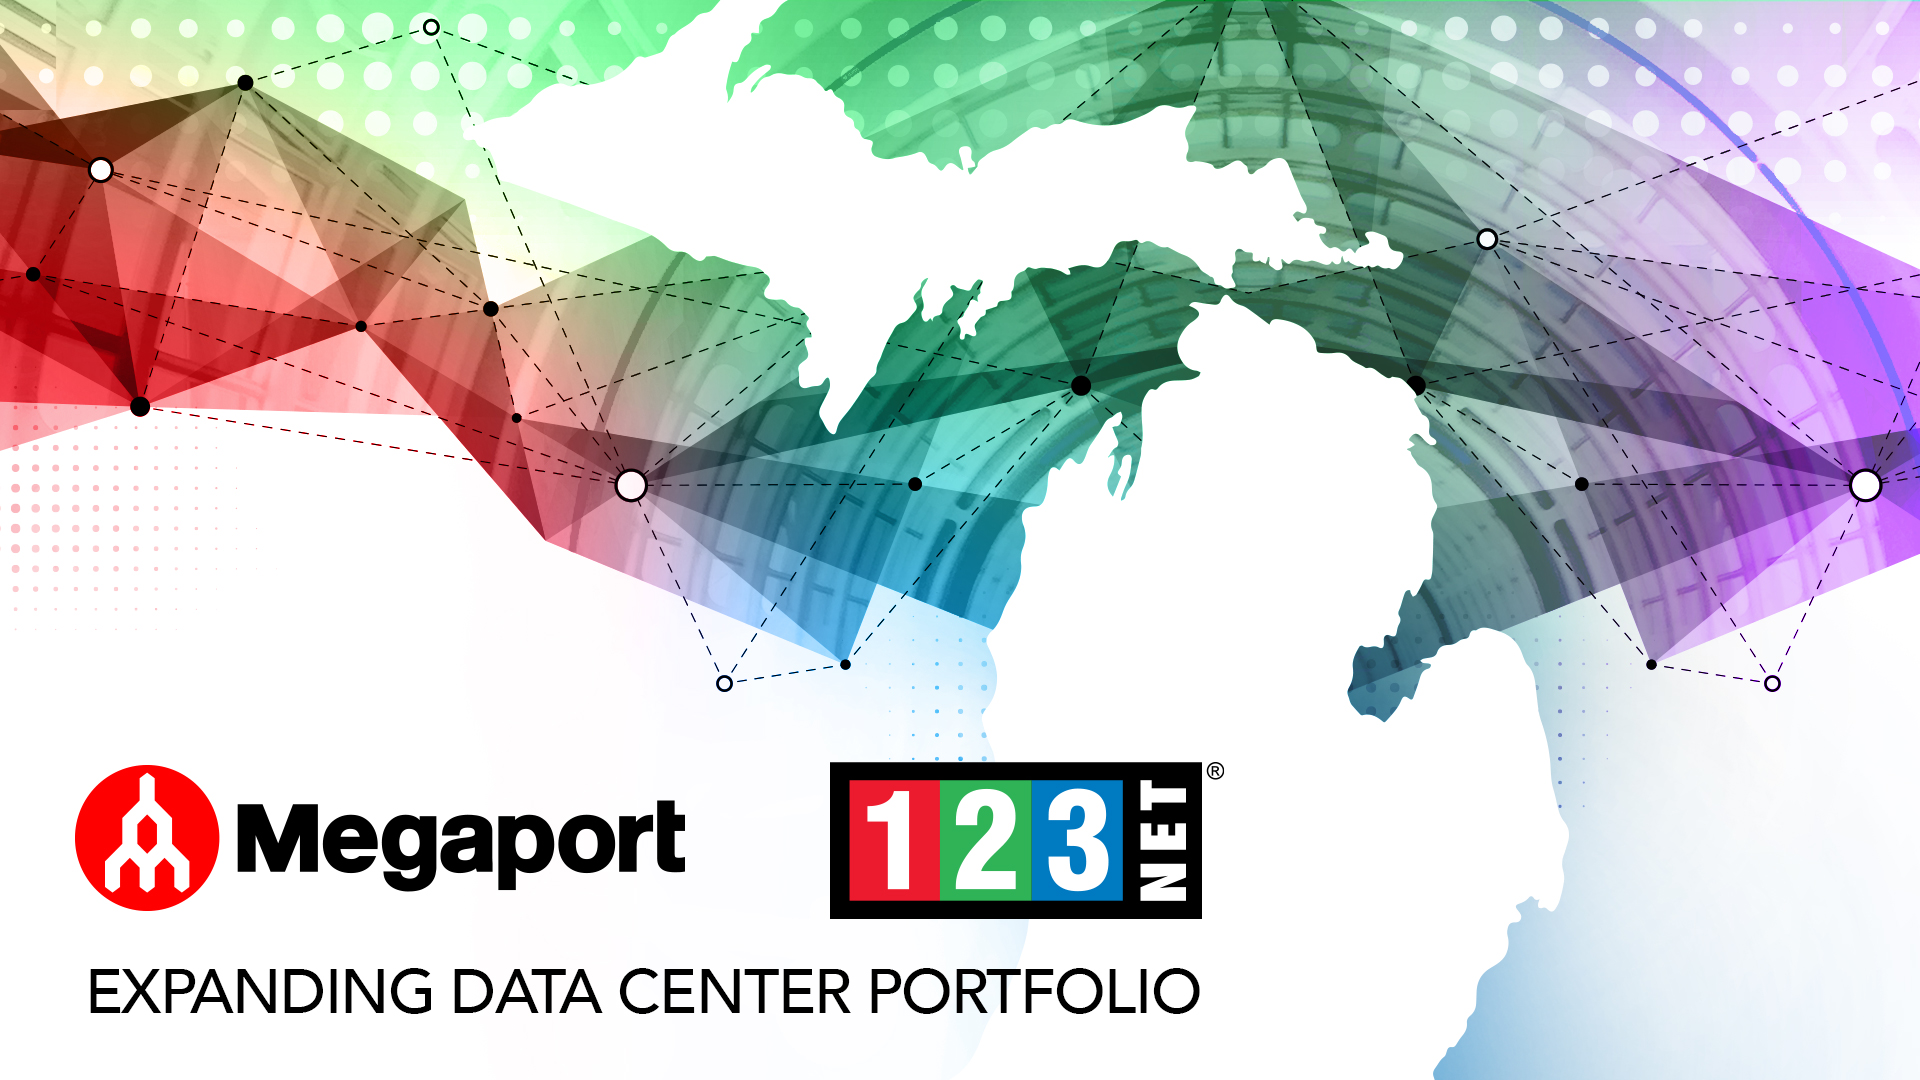 123NET Expands Data Center Portfolio with Megaport